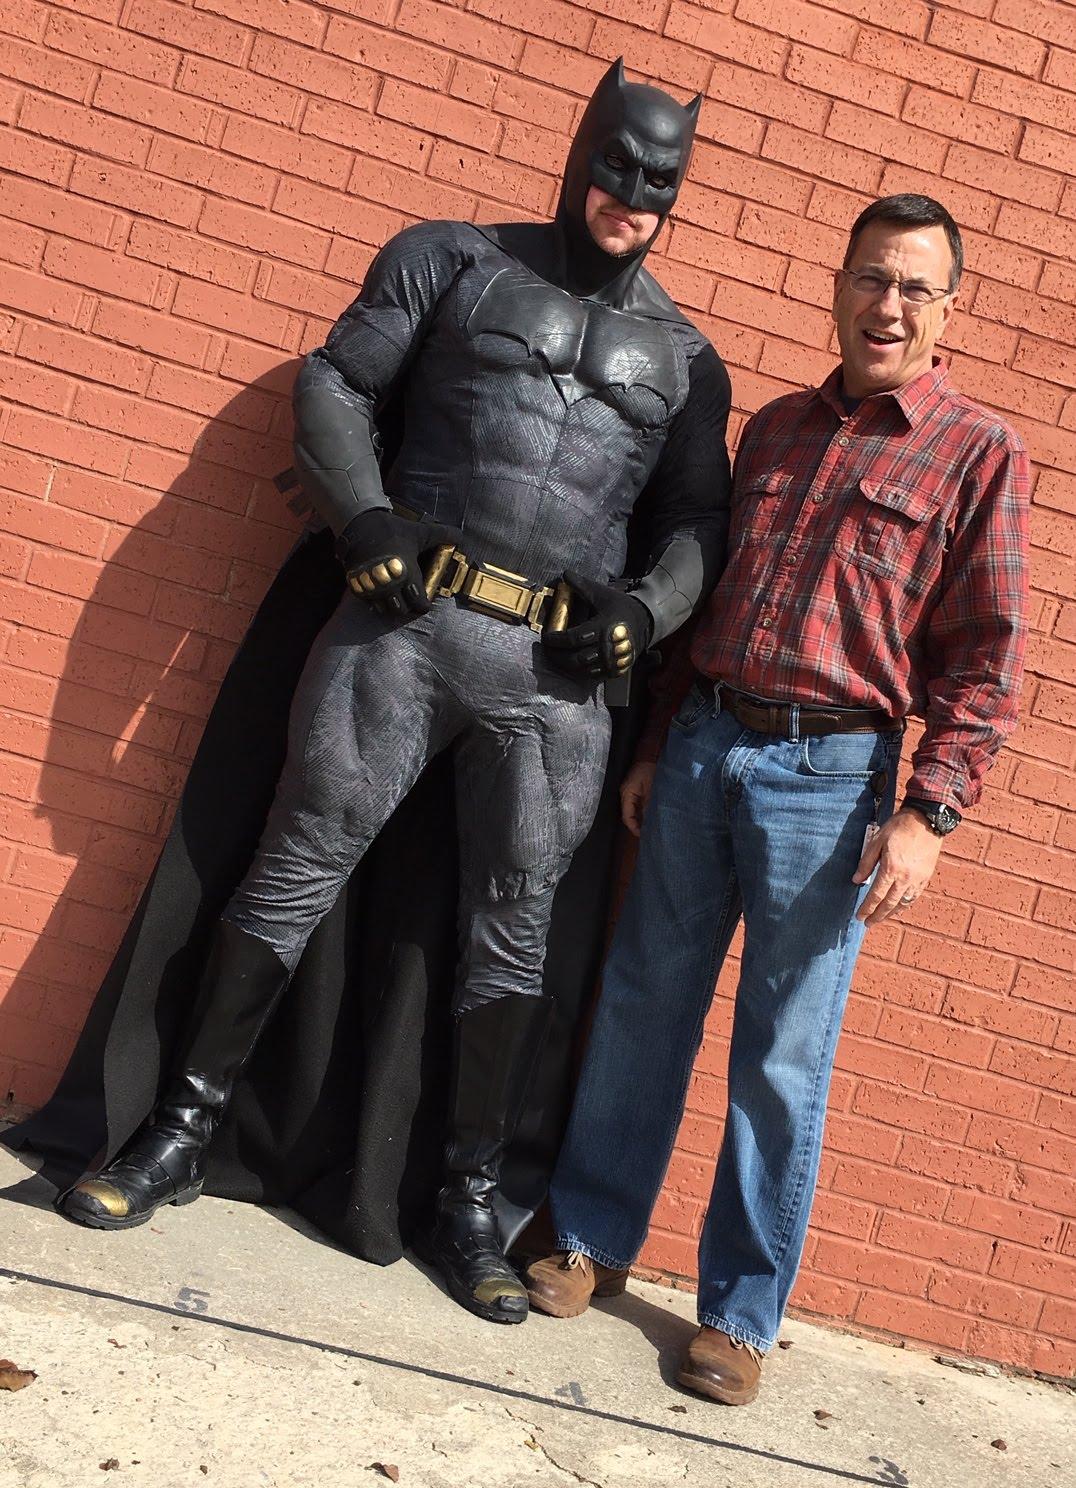 Batman with Principal Copeland